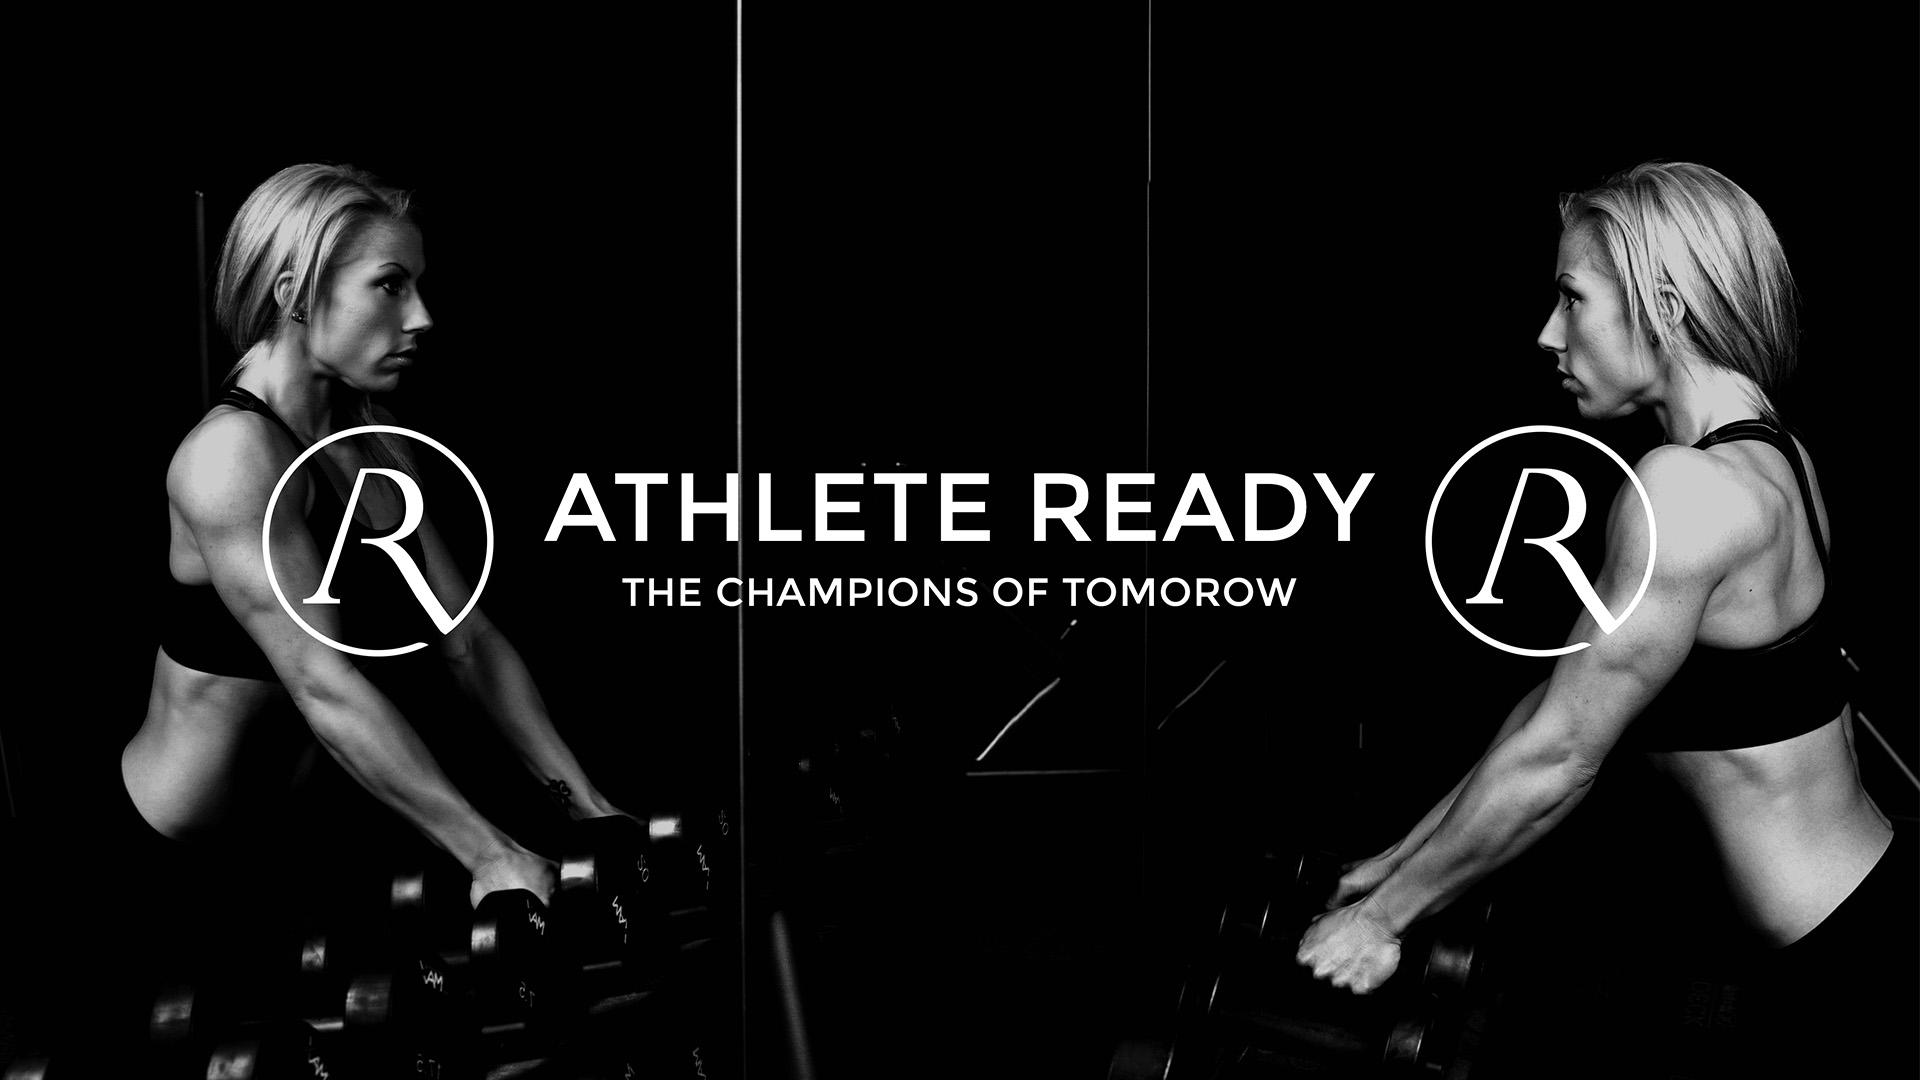 Athlete Ready Gym